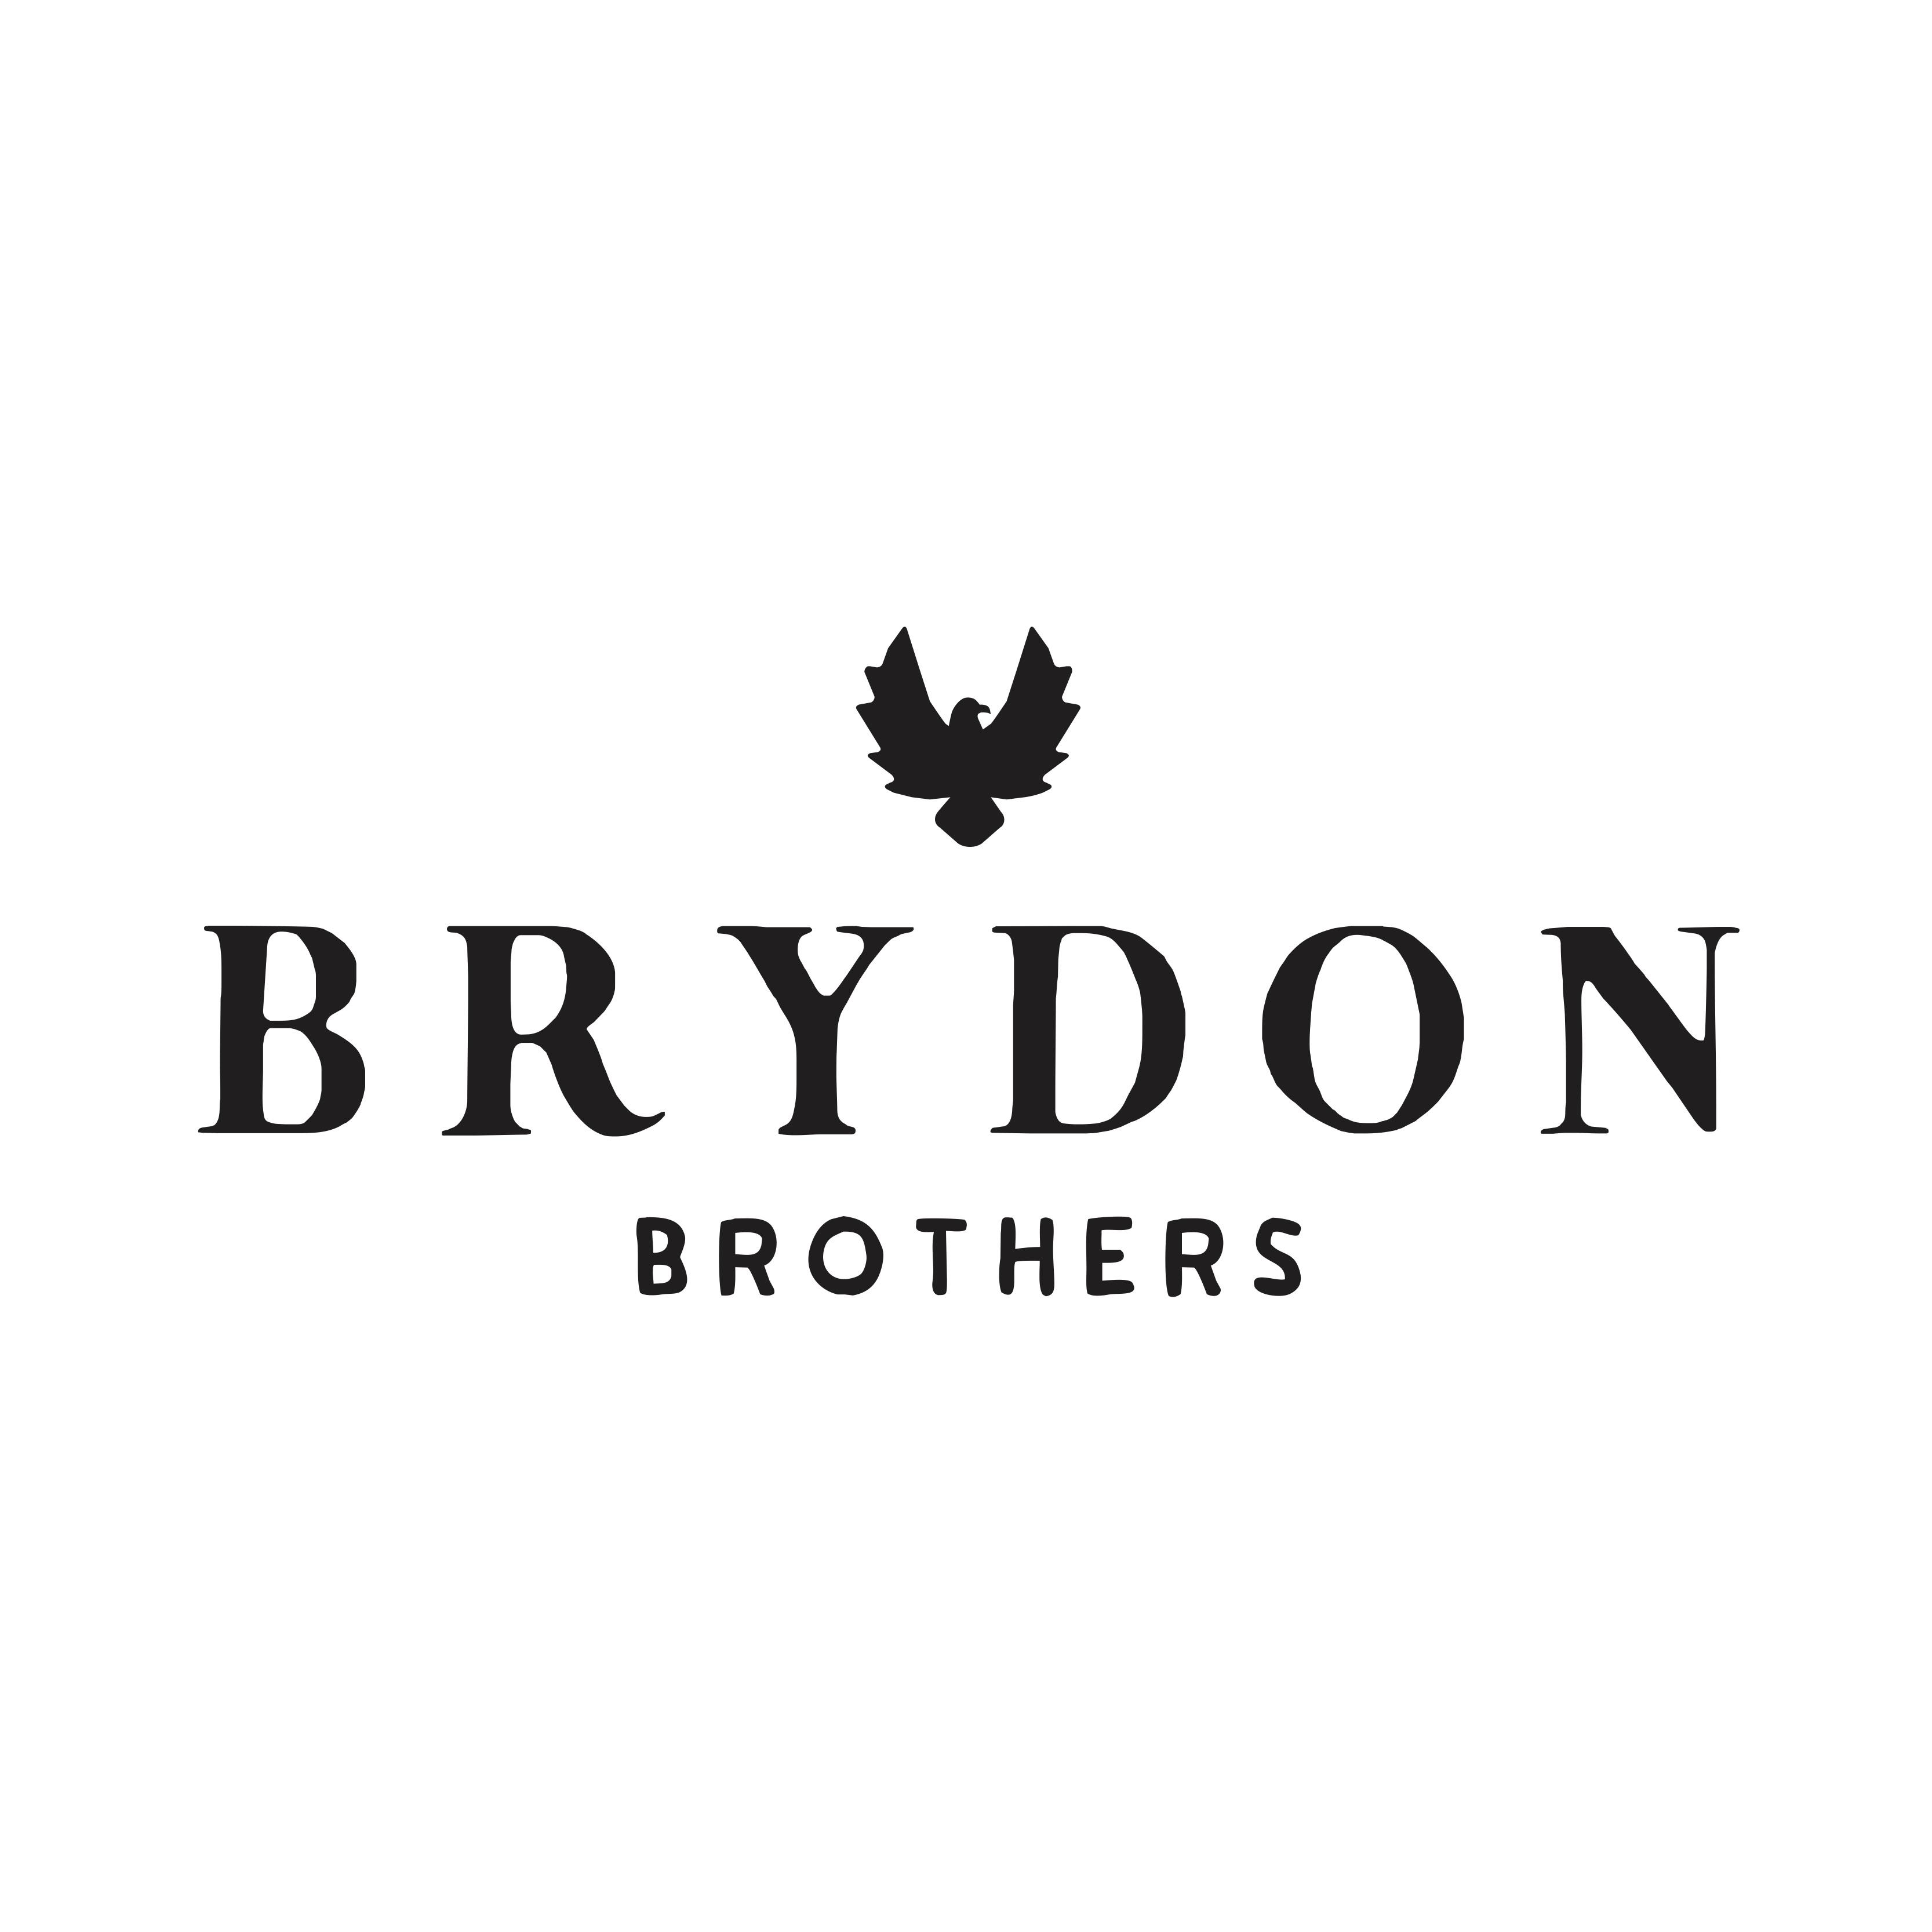 BRYDON BROTHERS LOGO